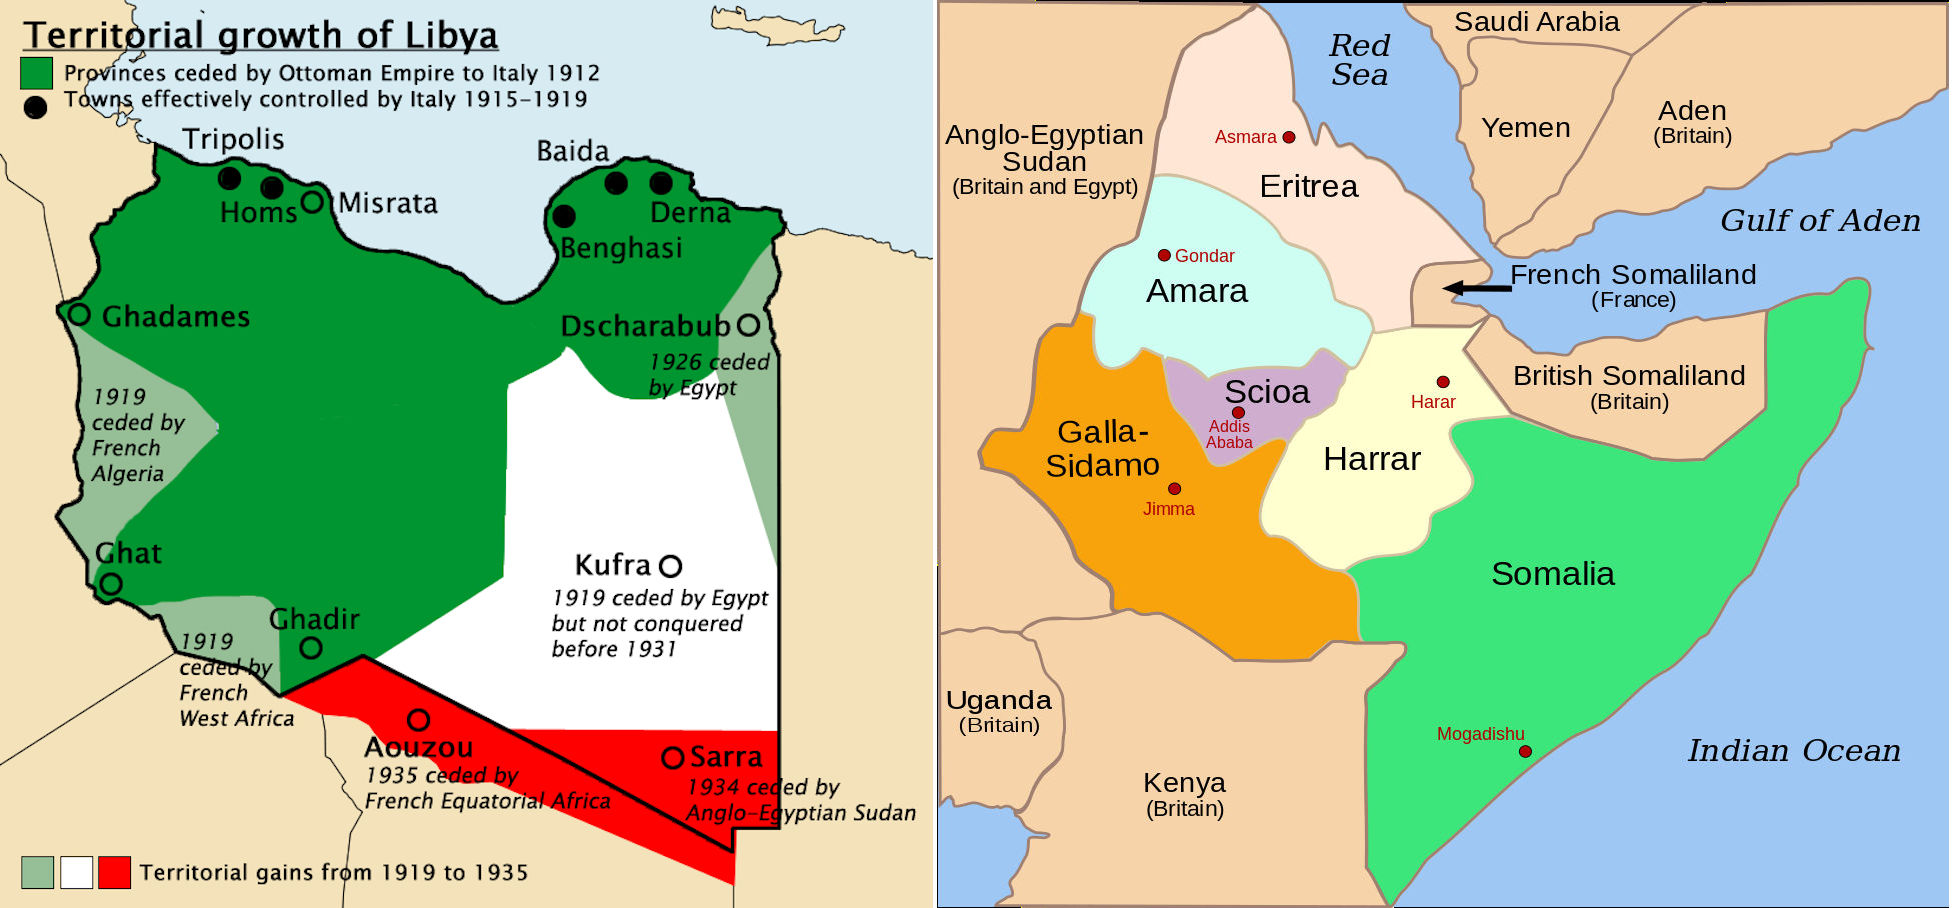 Libya_East_Africa_Italian